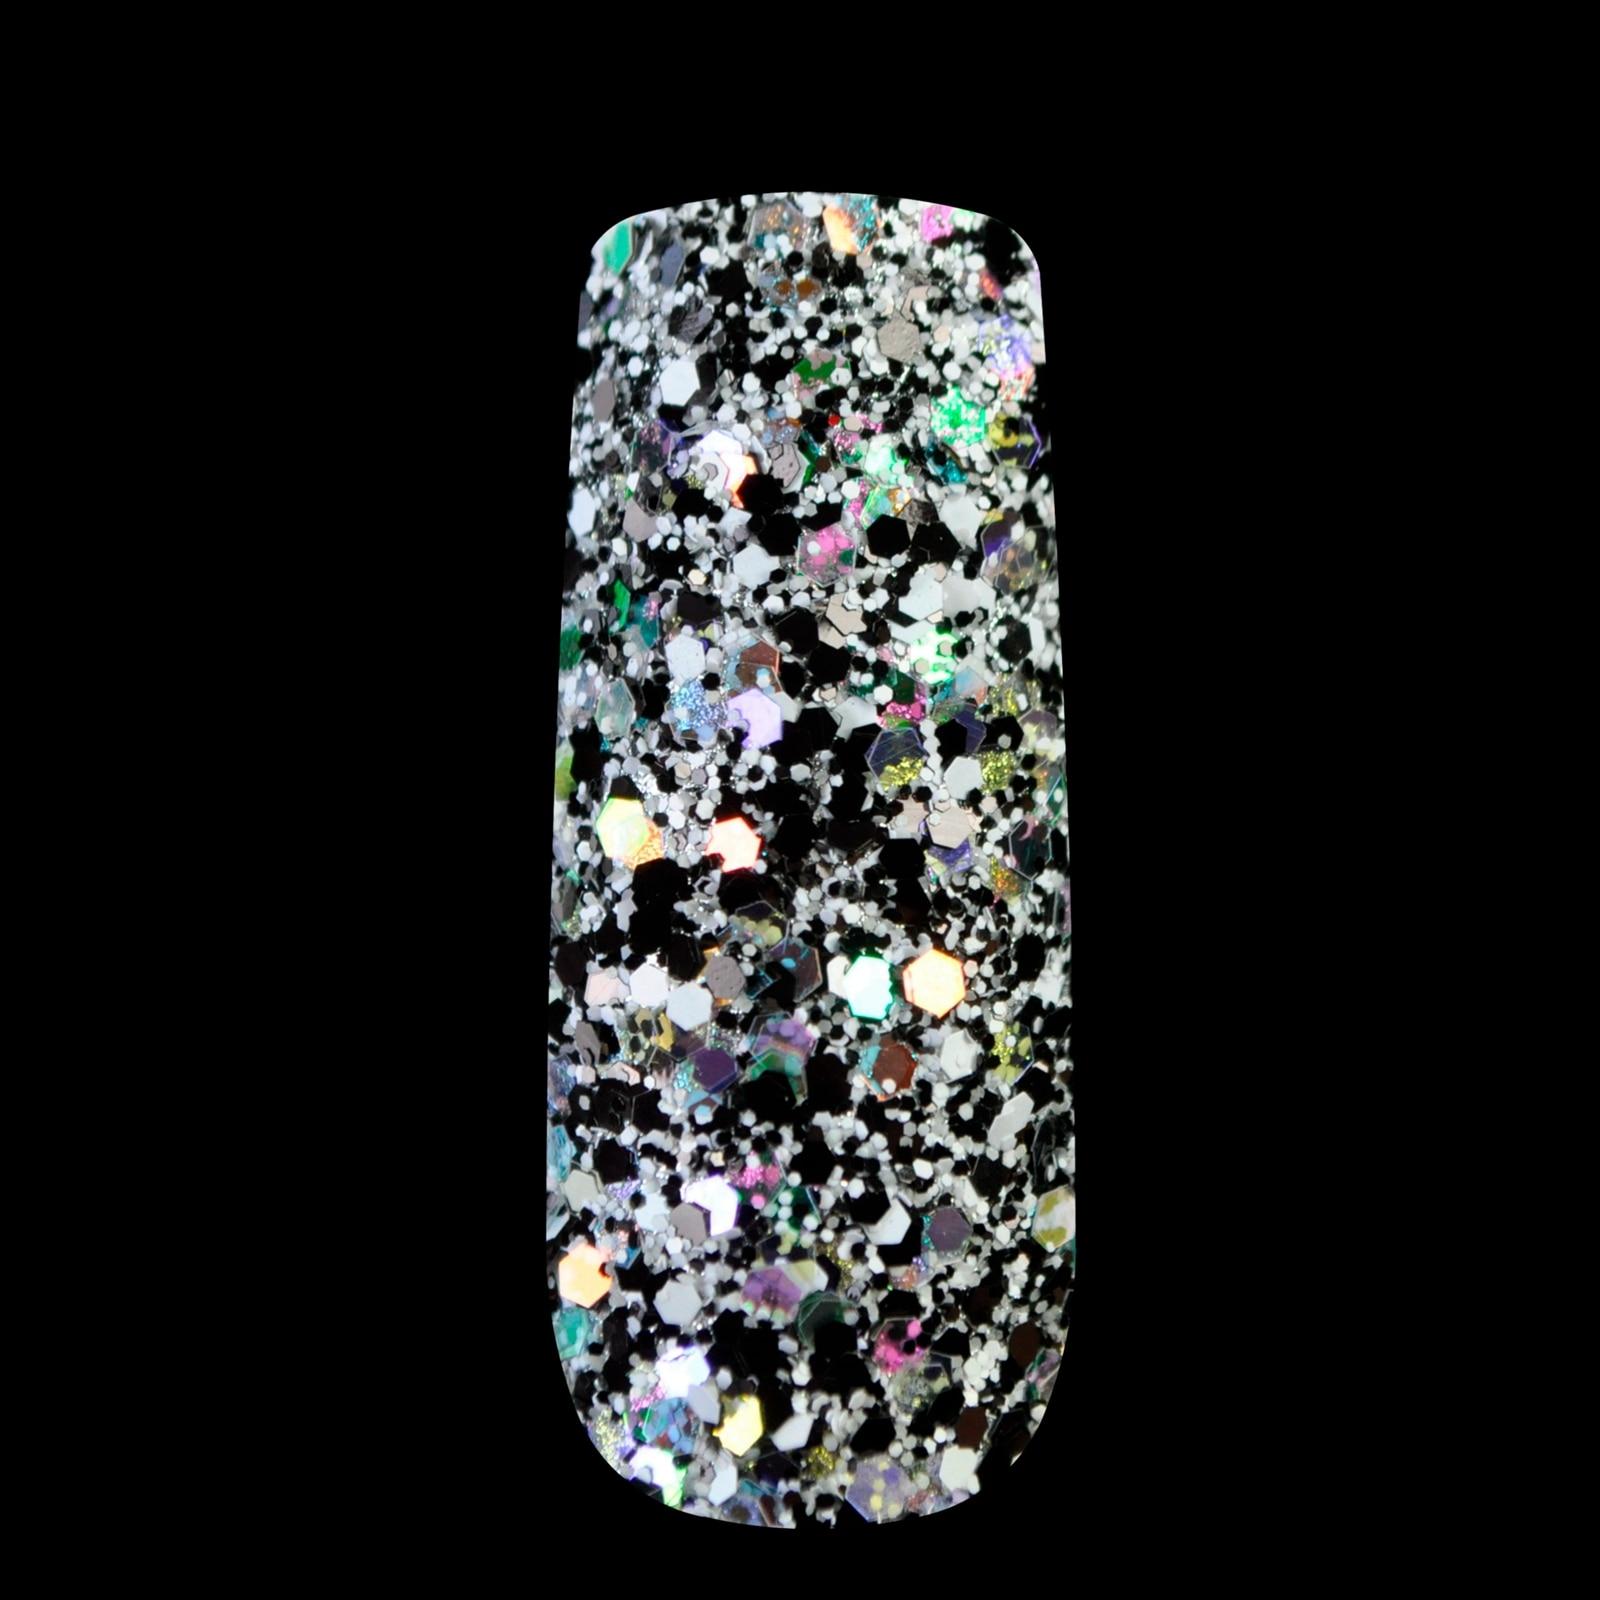 Dazzling Makeup Glitter Colored Nail Art Glitter Mix DIY Manicure 3D ...